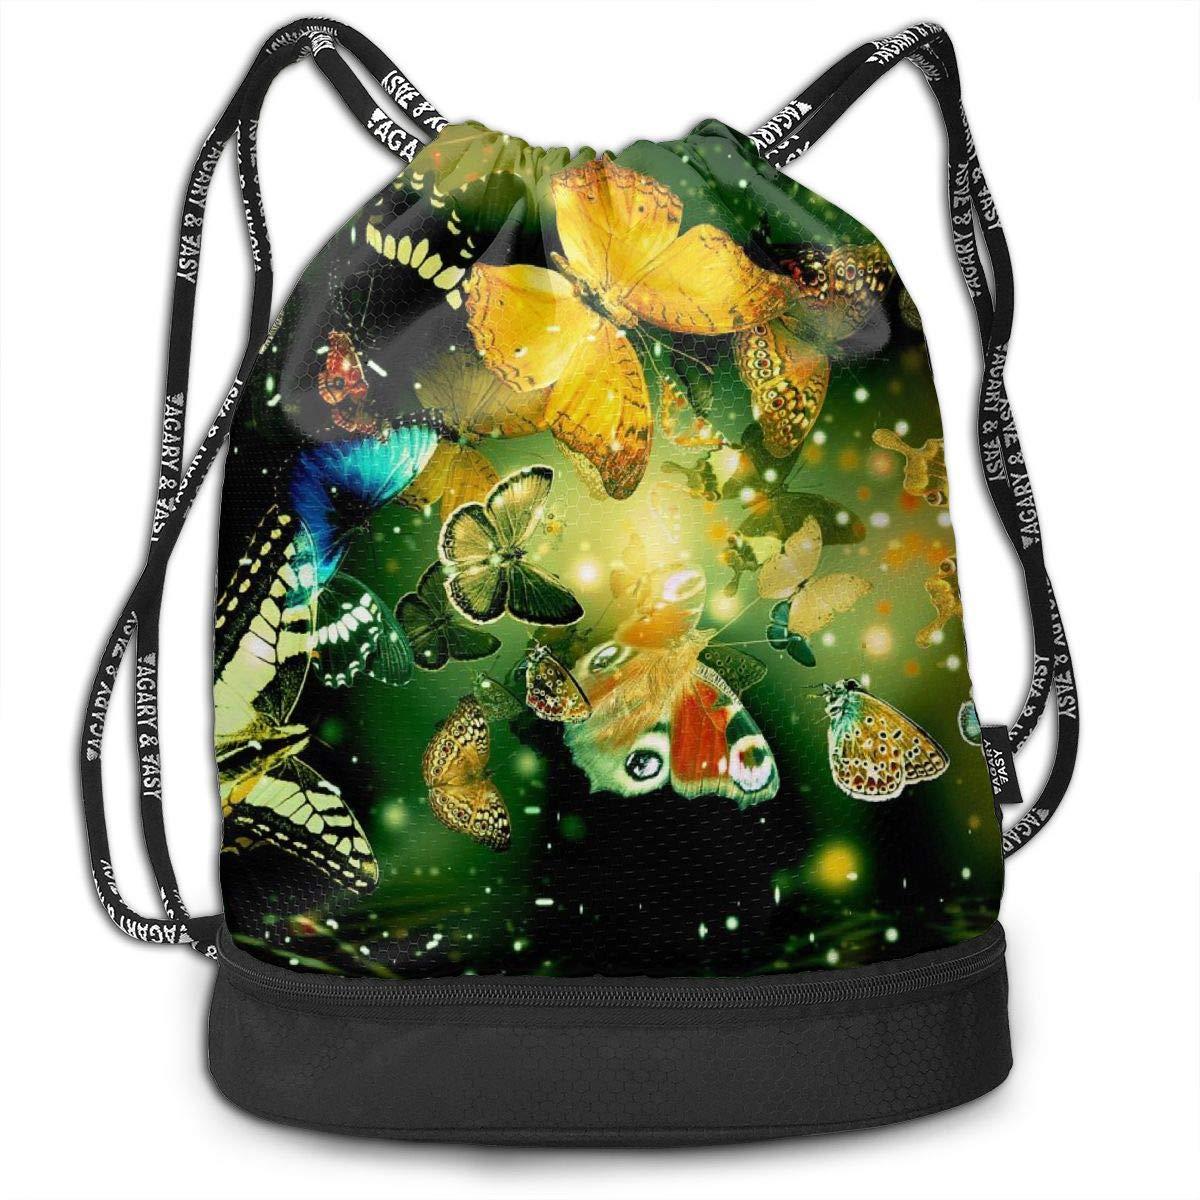 Portable Bundle Backpack Abstract Yin Yang Smog Drawstring Bag For Girls /& Boys Gym Yoga Runner Sports Daypack